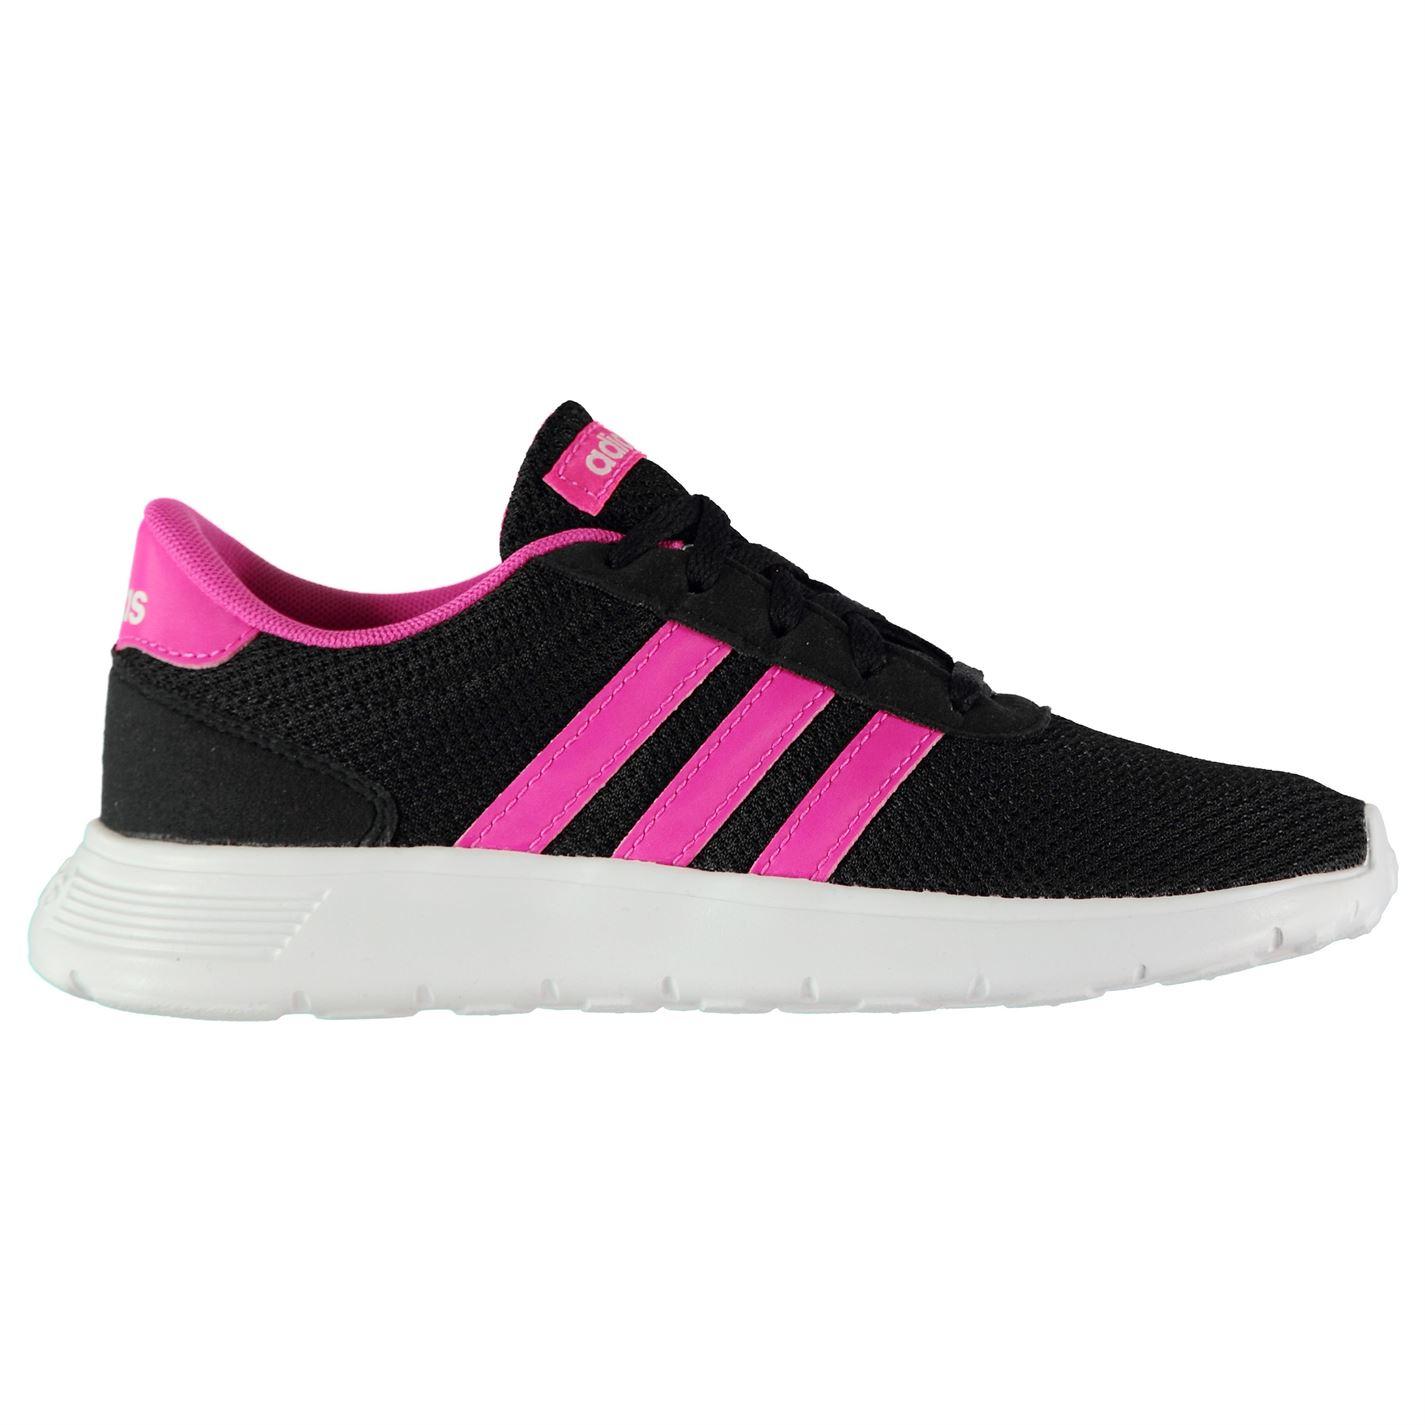 Adidas Lite Racer Child Girls Trainers